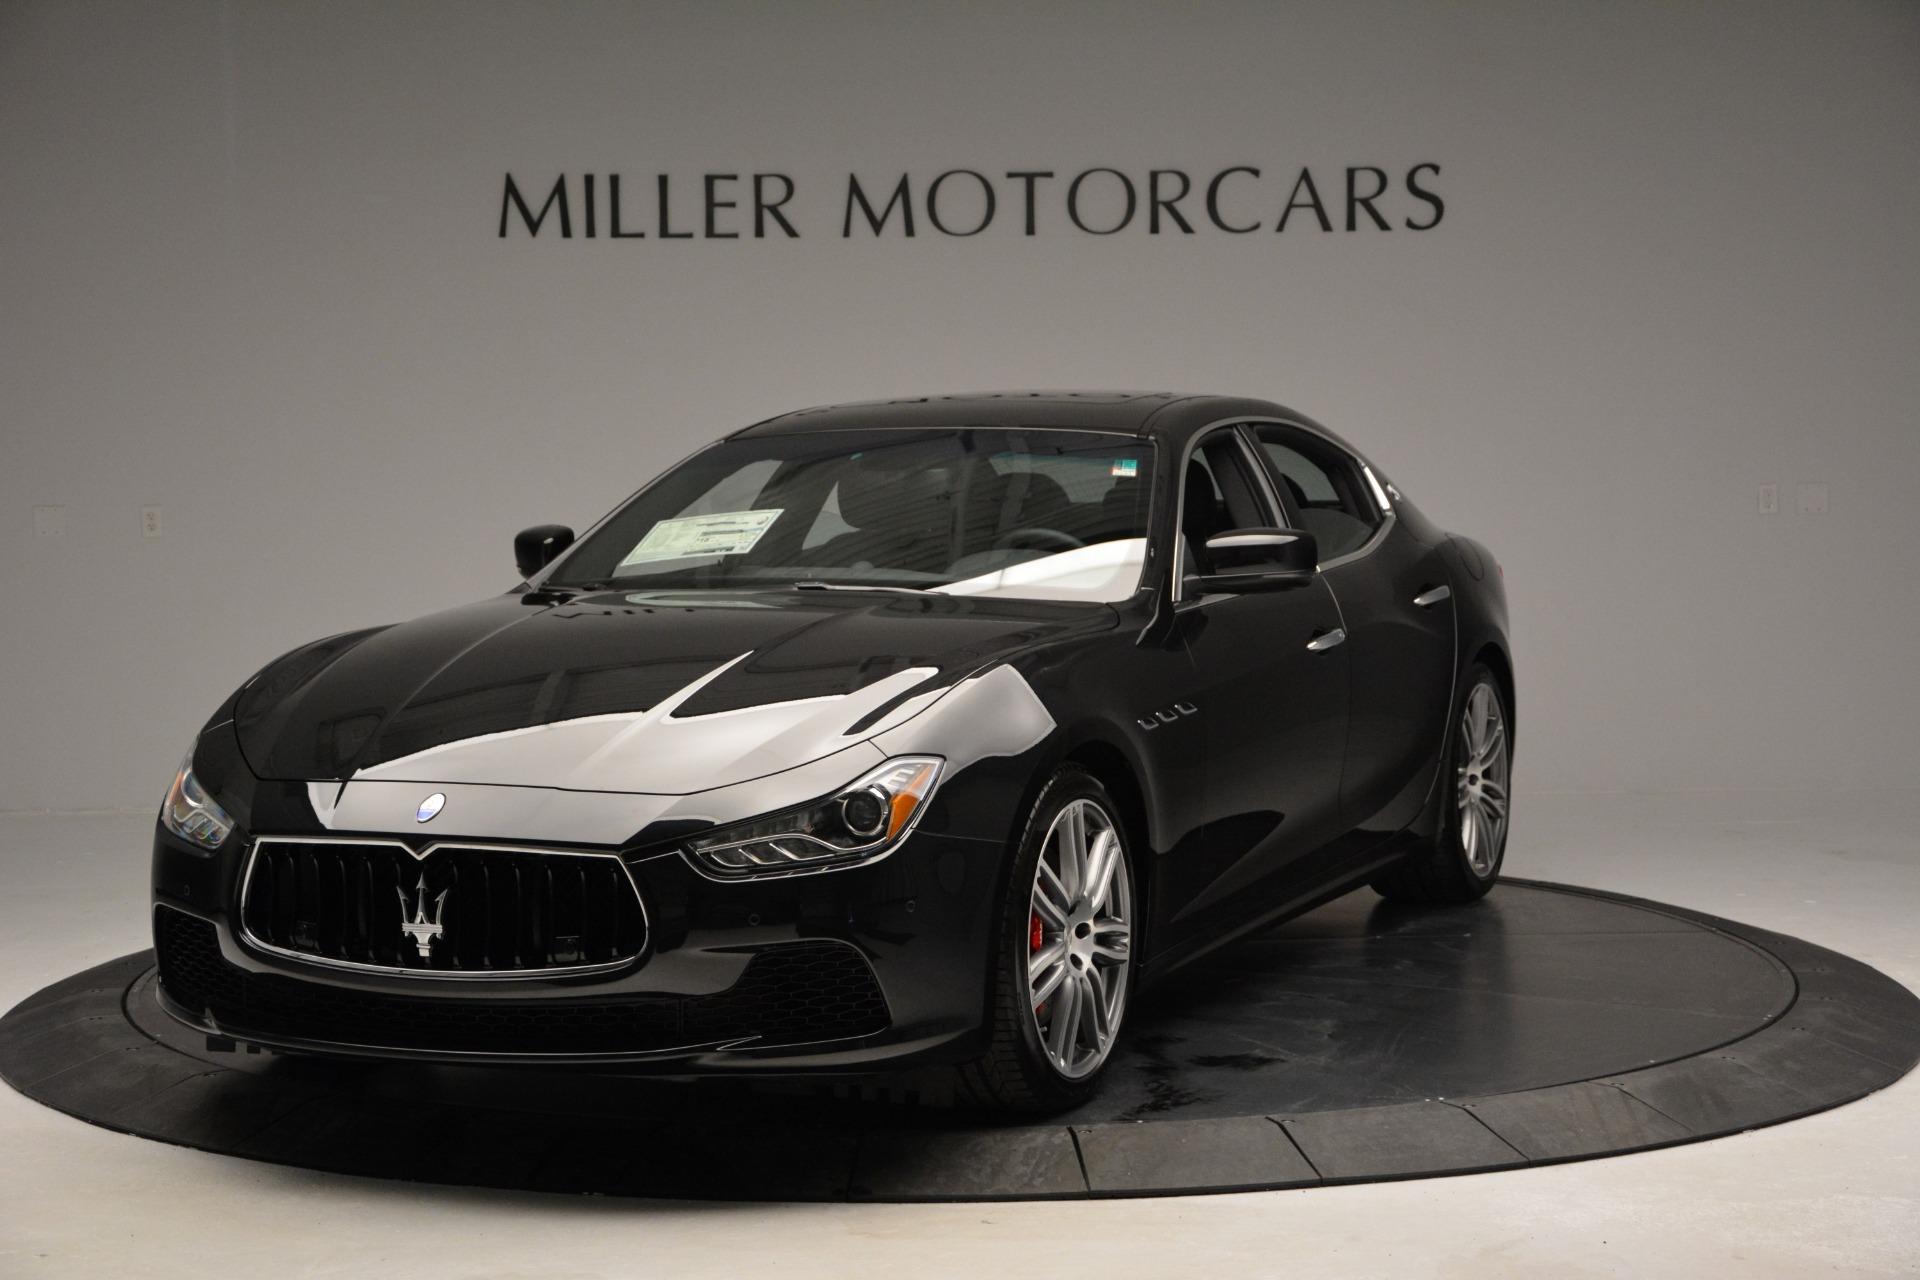 Used 2015 Maserati Ghibli S Q4 For Sale In Greenwich, CT. Alfa Romeo of Greenwich, 7325 2070_main